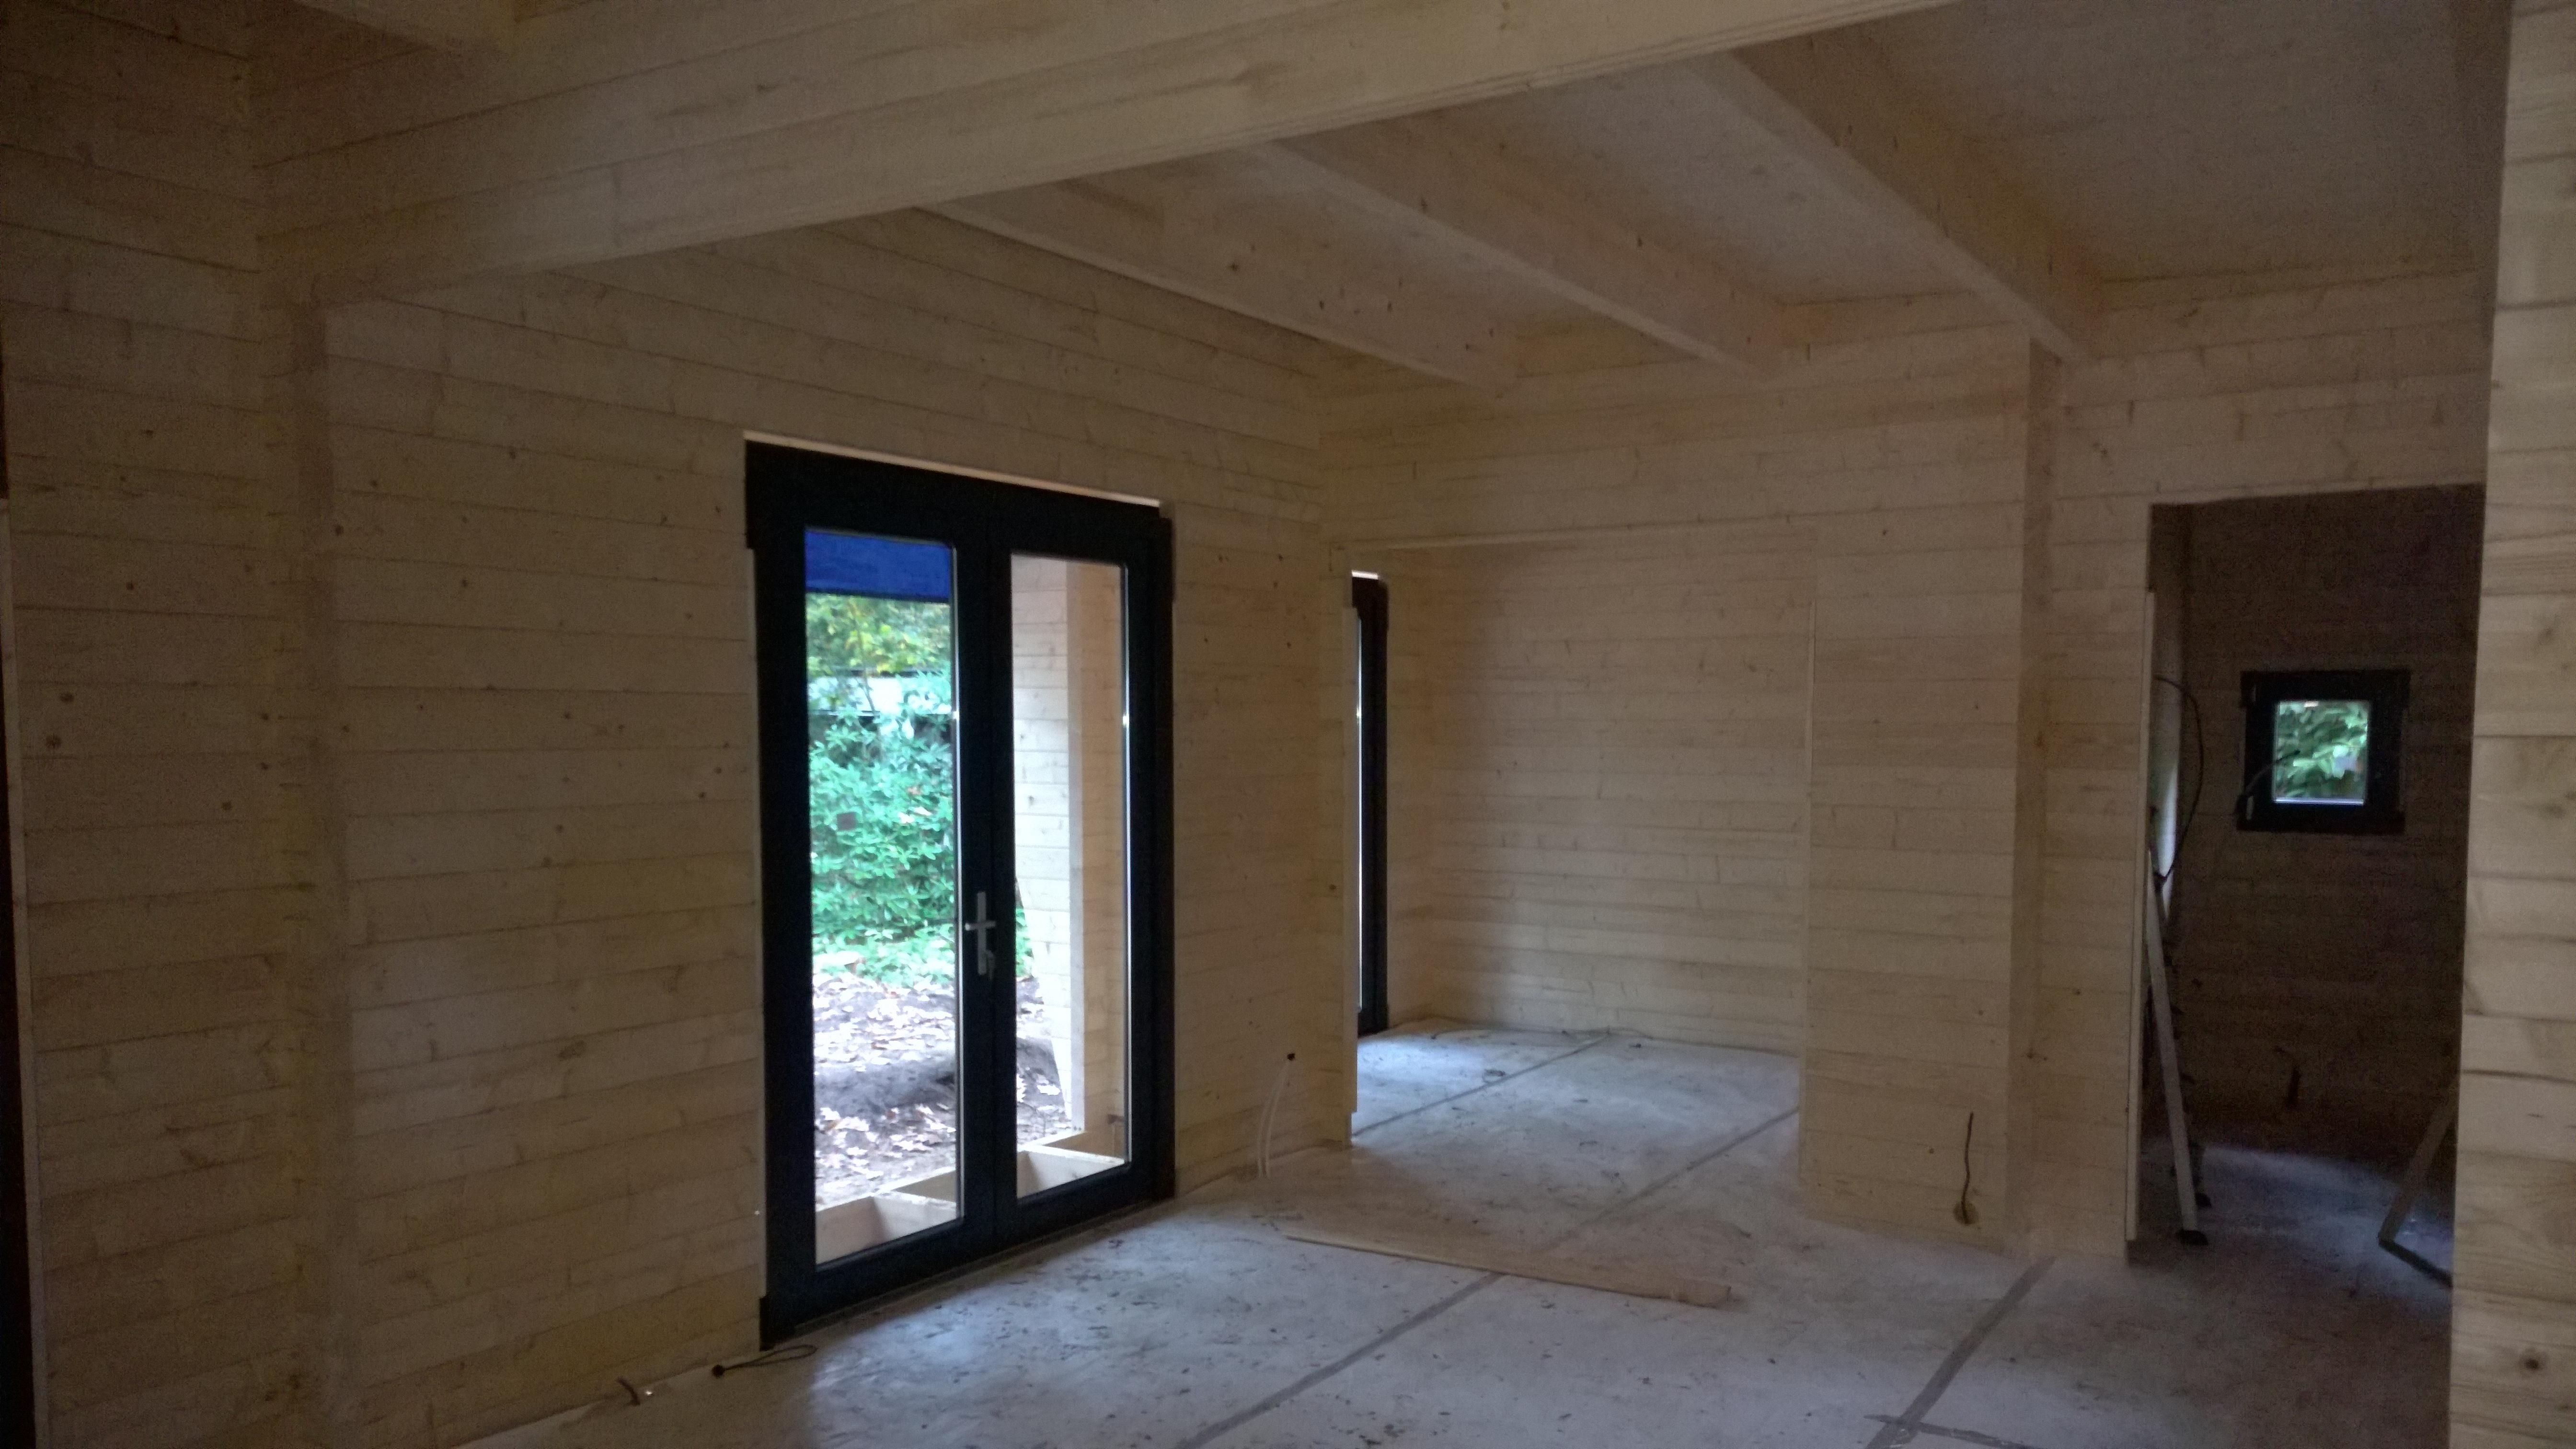 Atelier gerard ter hofte bunkie recreatie woning hout natuur